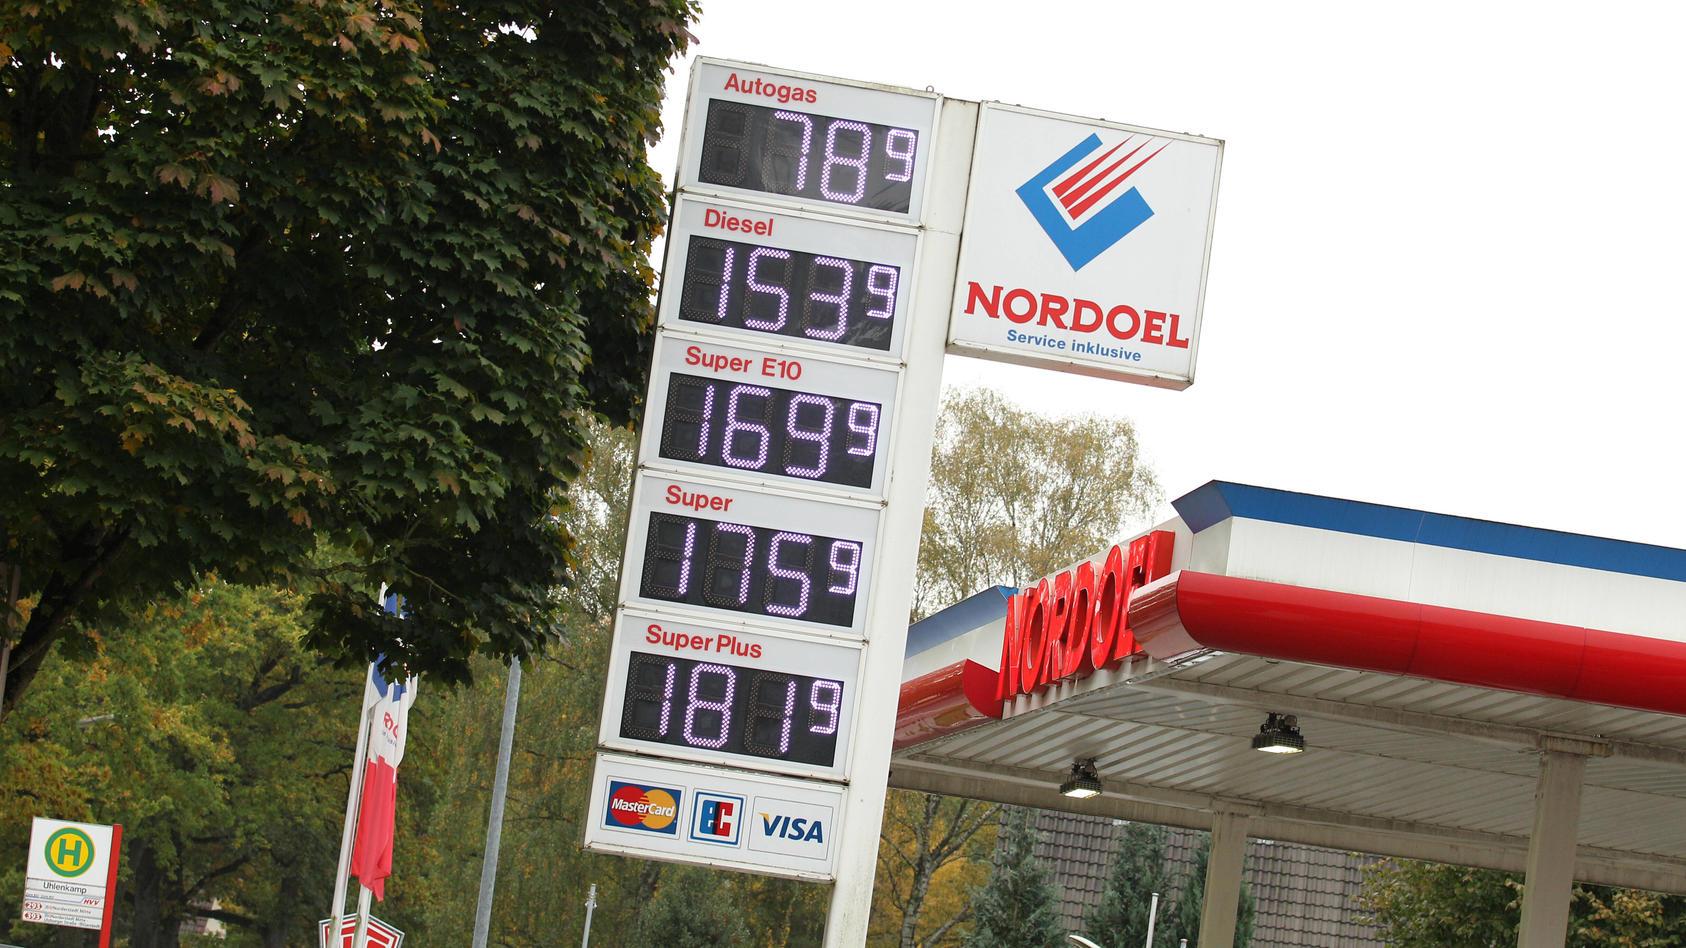 so-teuer-ist-tanken-in-norderstedt-hamburg